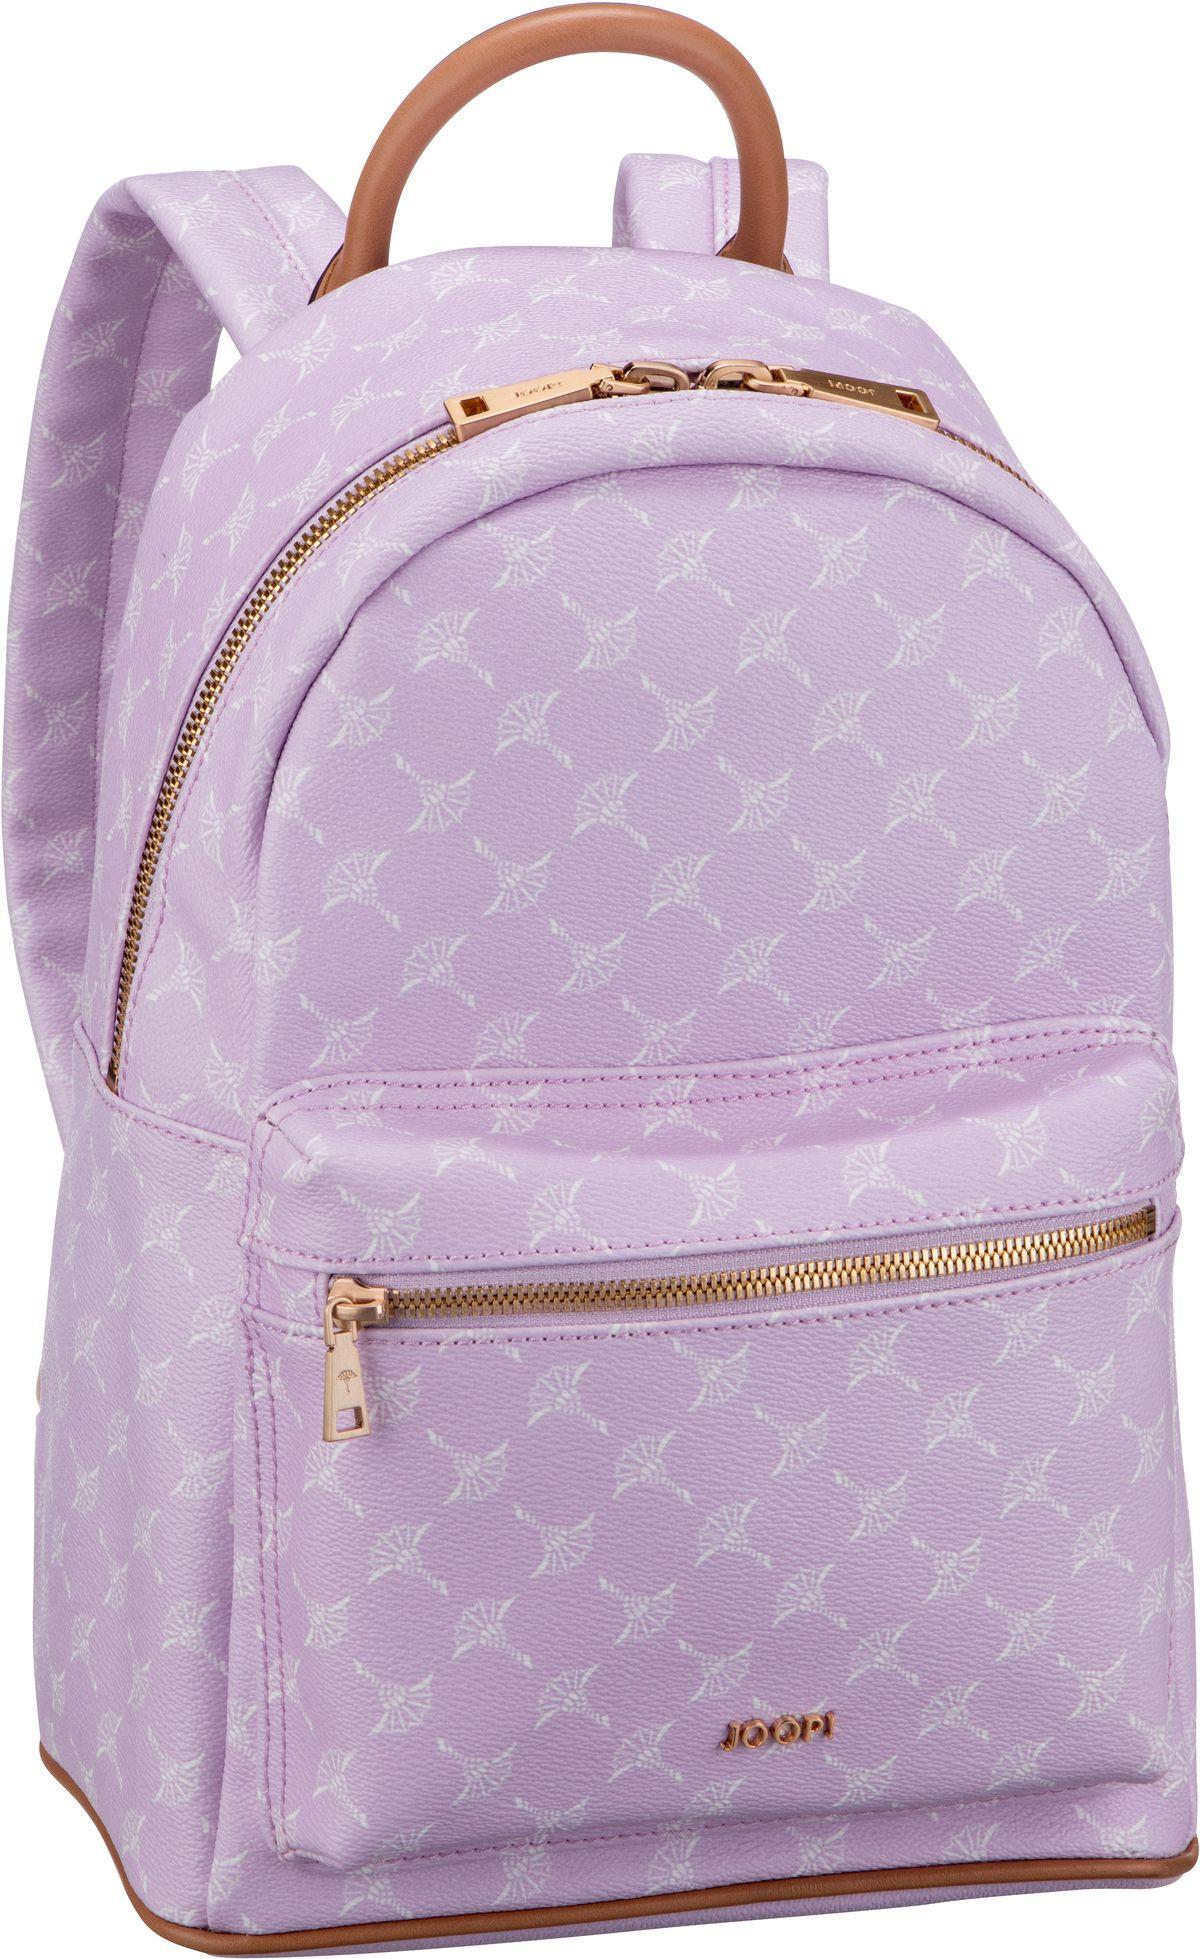 Rucksack / Daypack Cortina Salome BackPack M Lavender